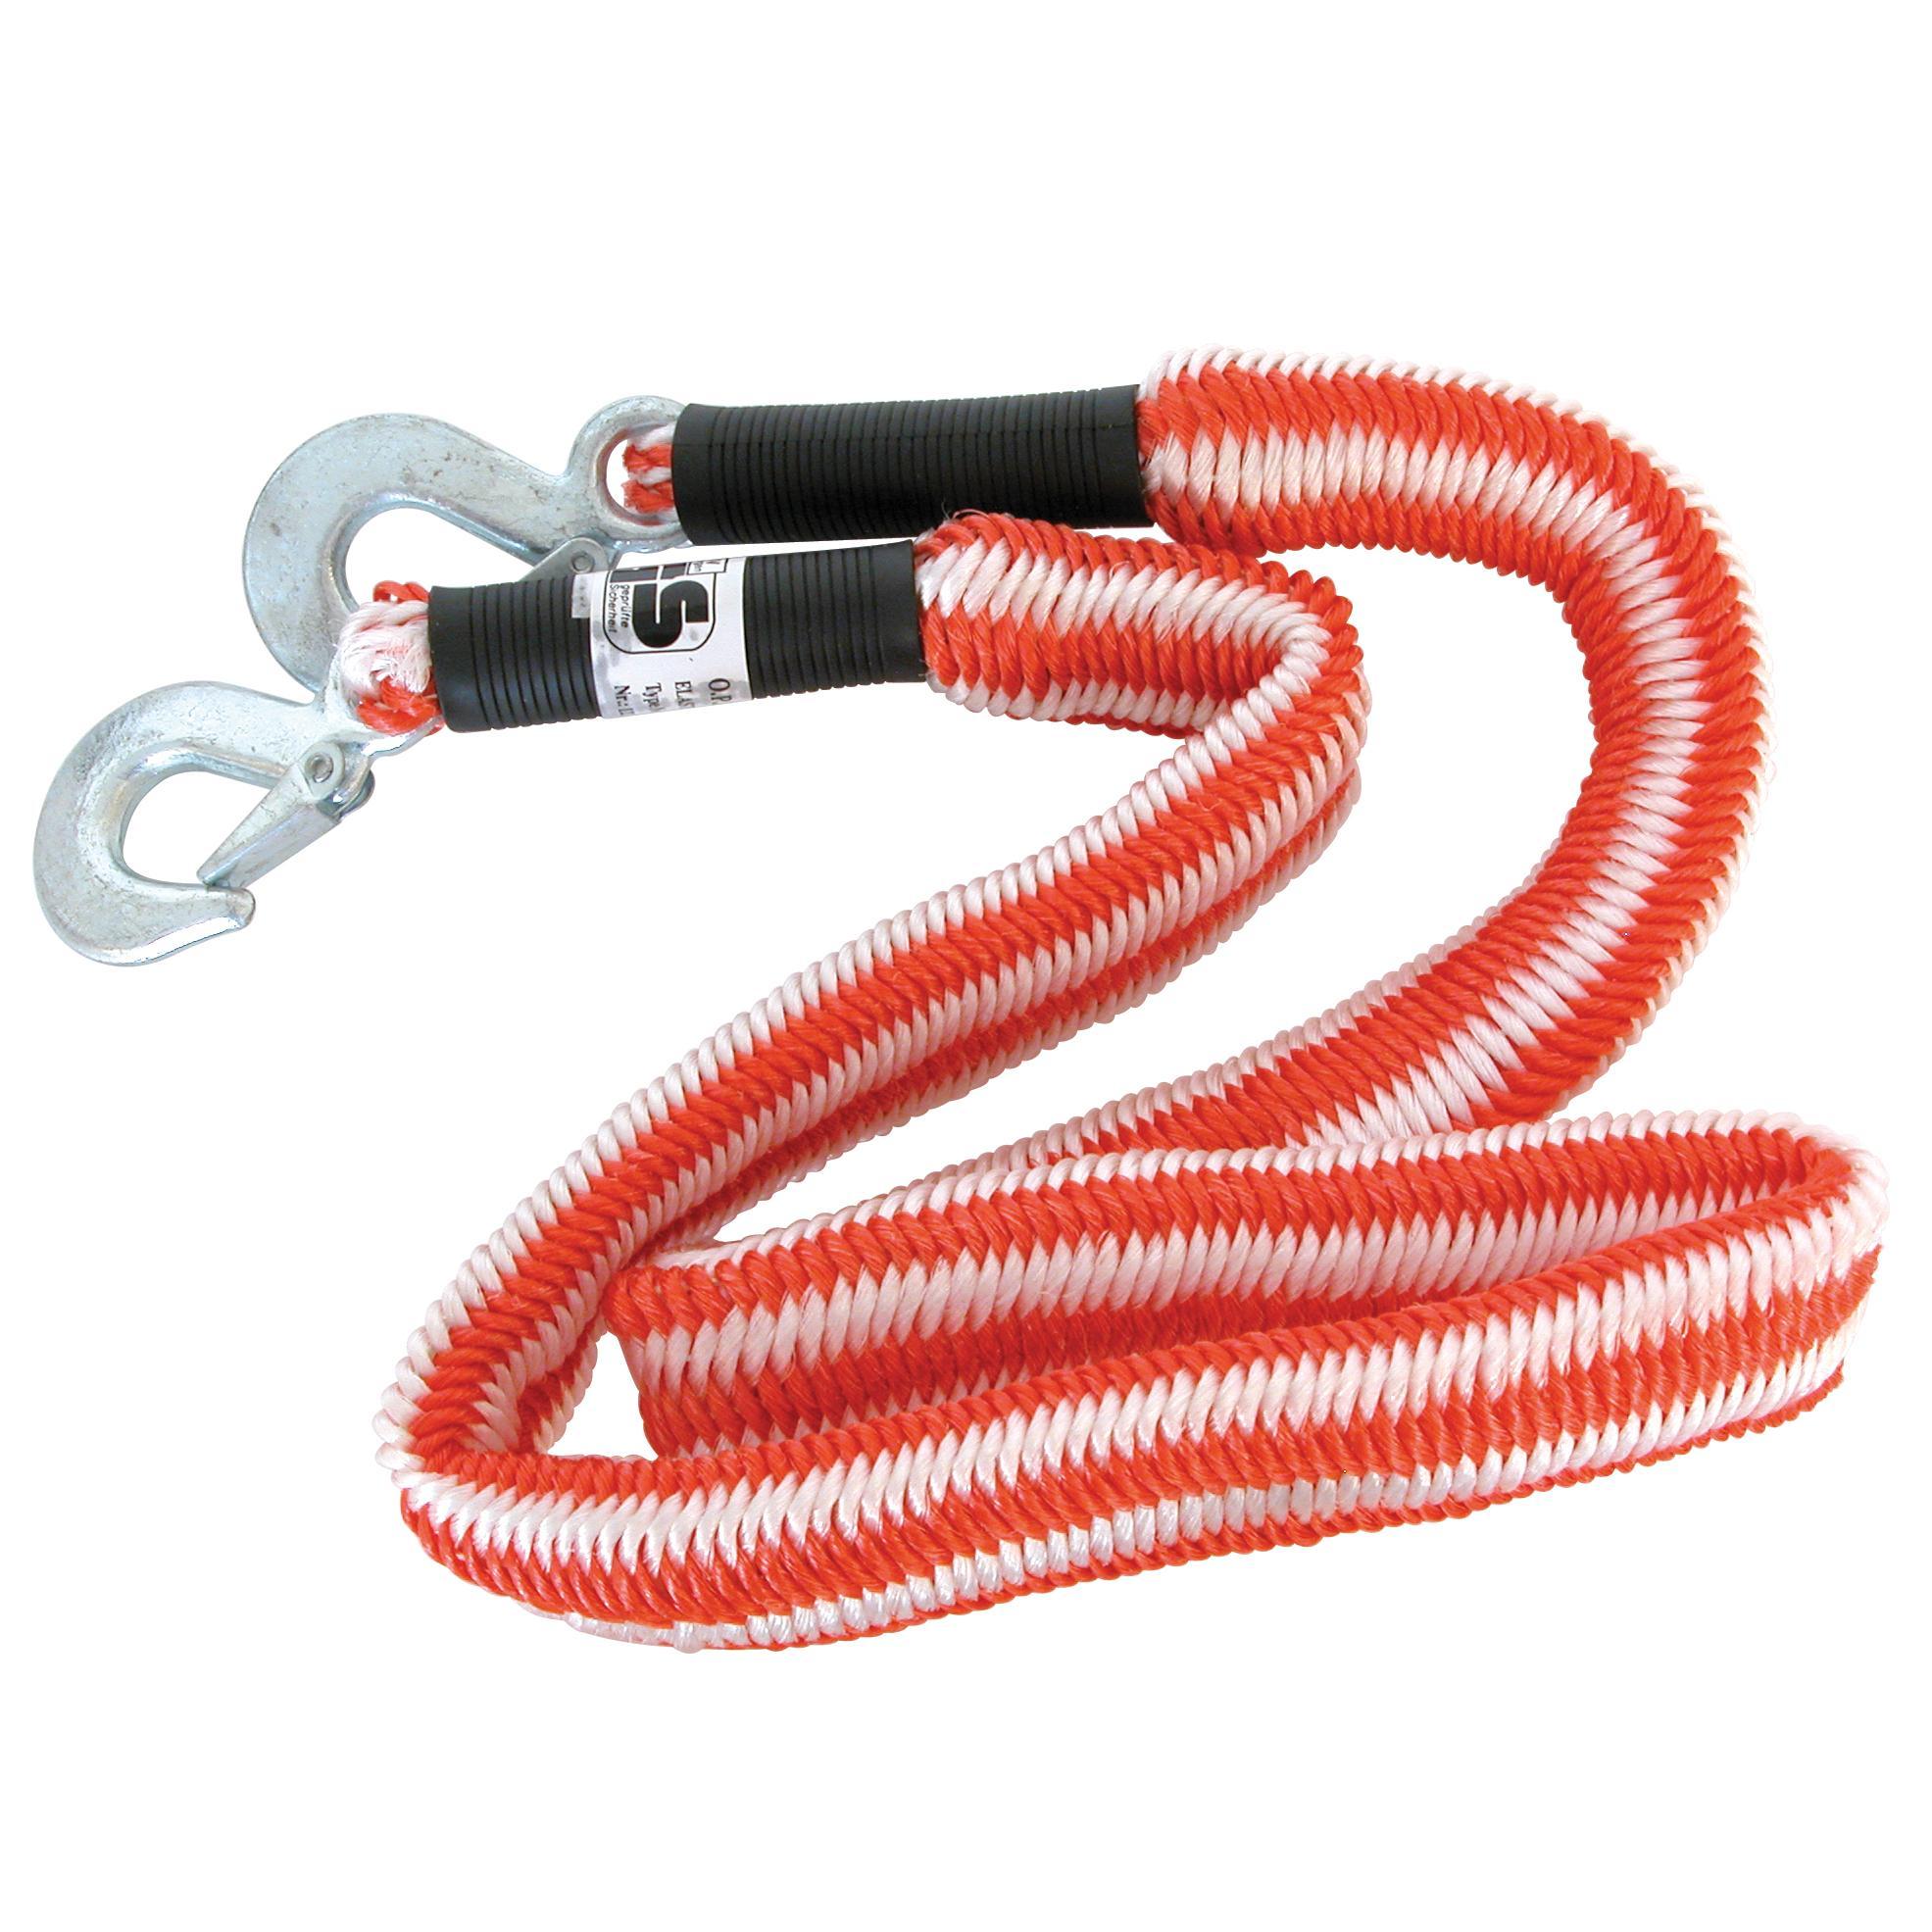 accessoires remorque adnauto cable remorquage ela 217303. Black Bedroom Furniture Sets. Home Design Ideas